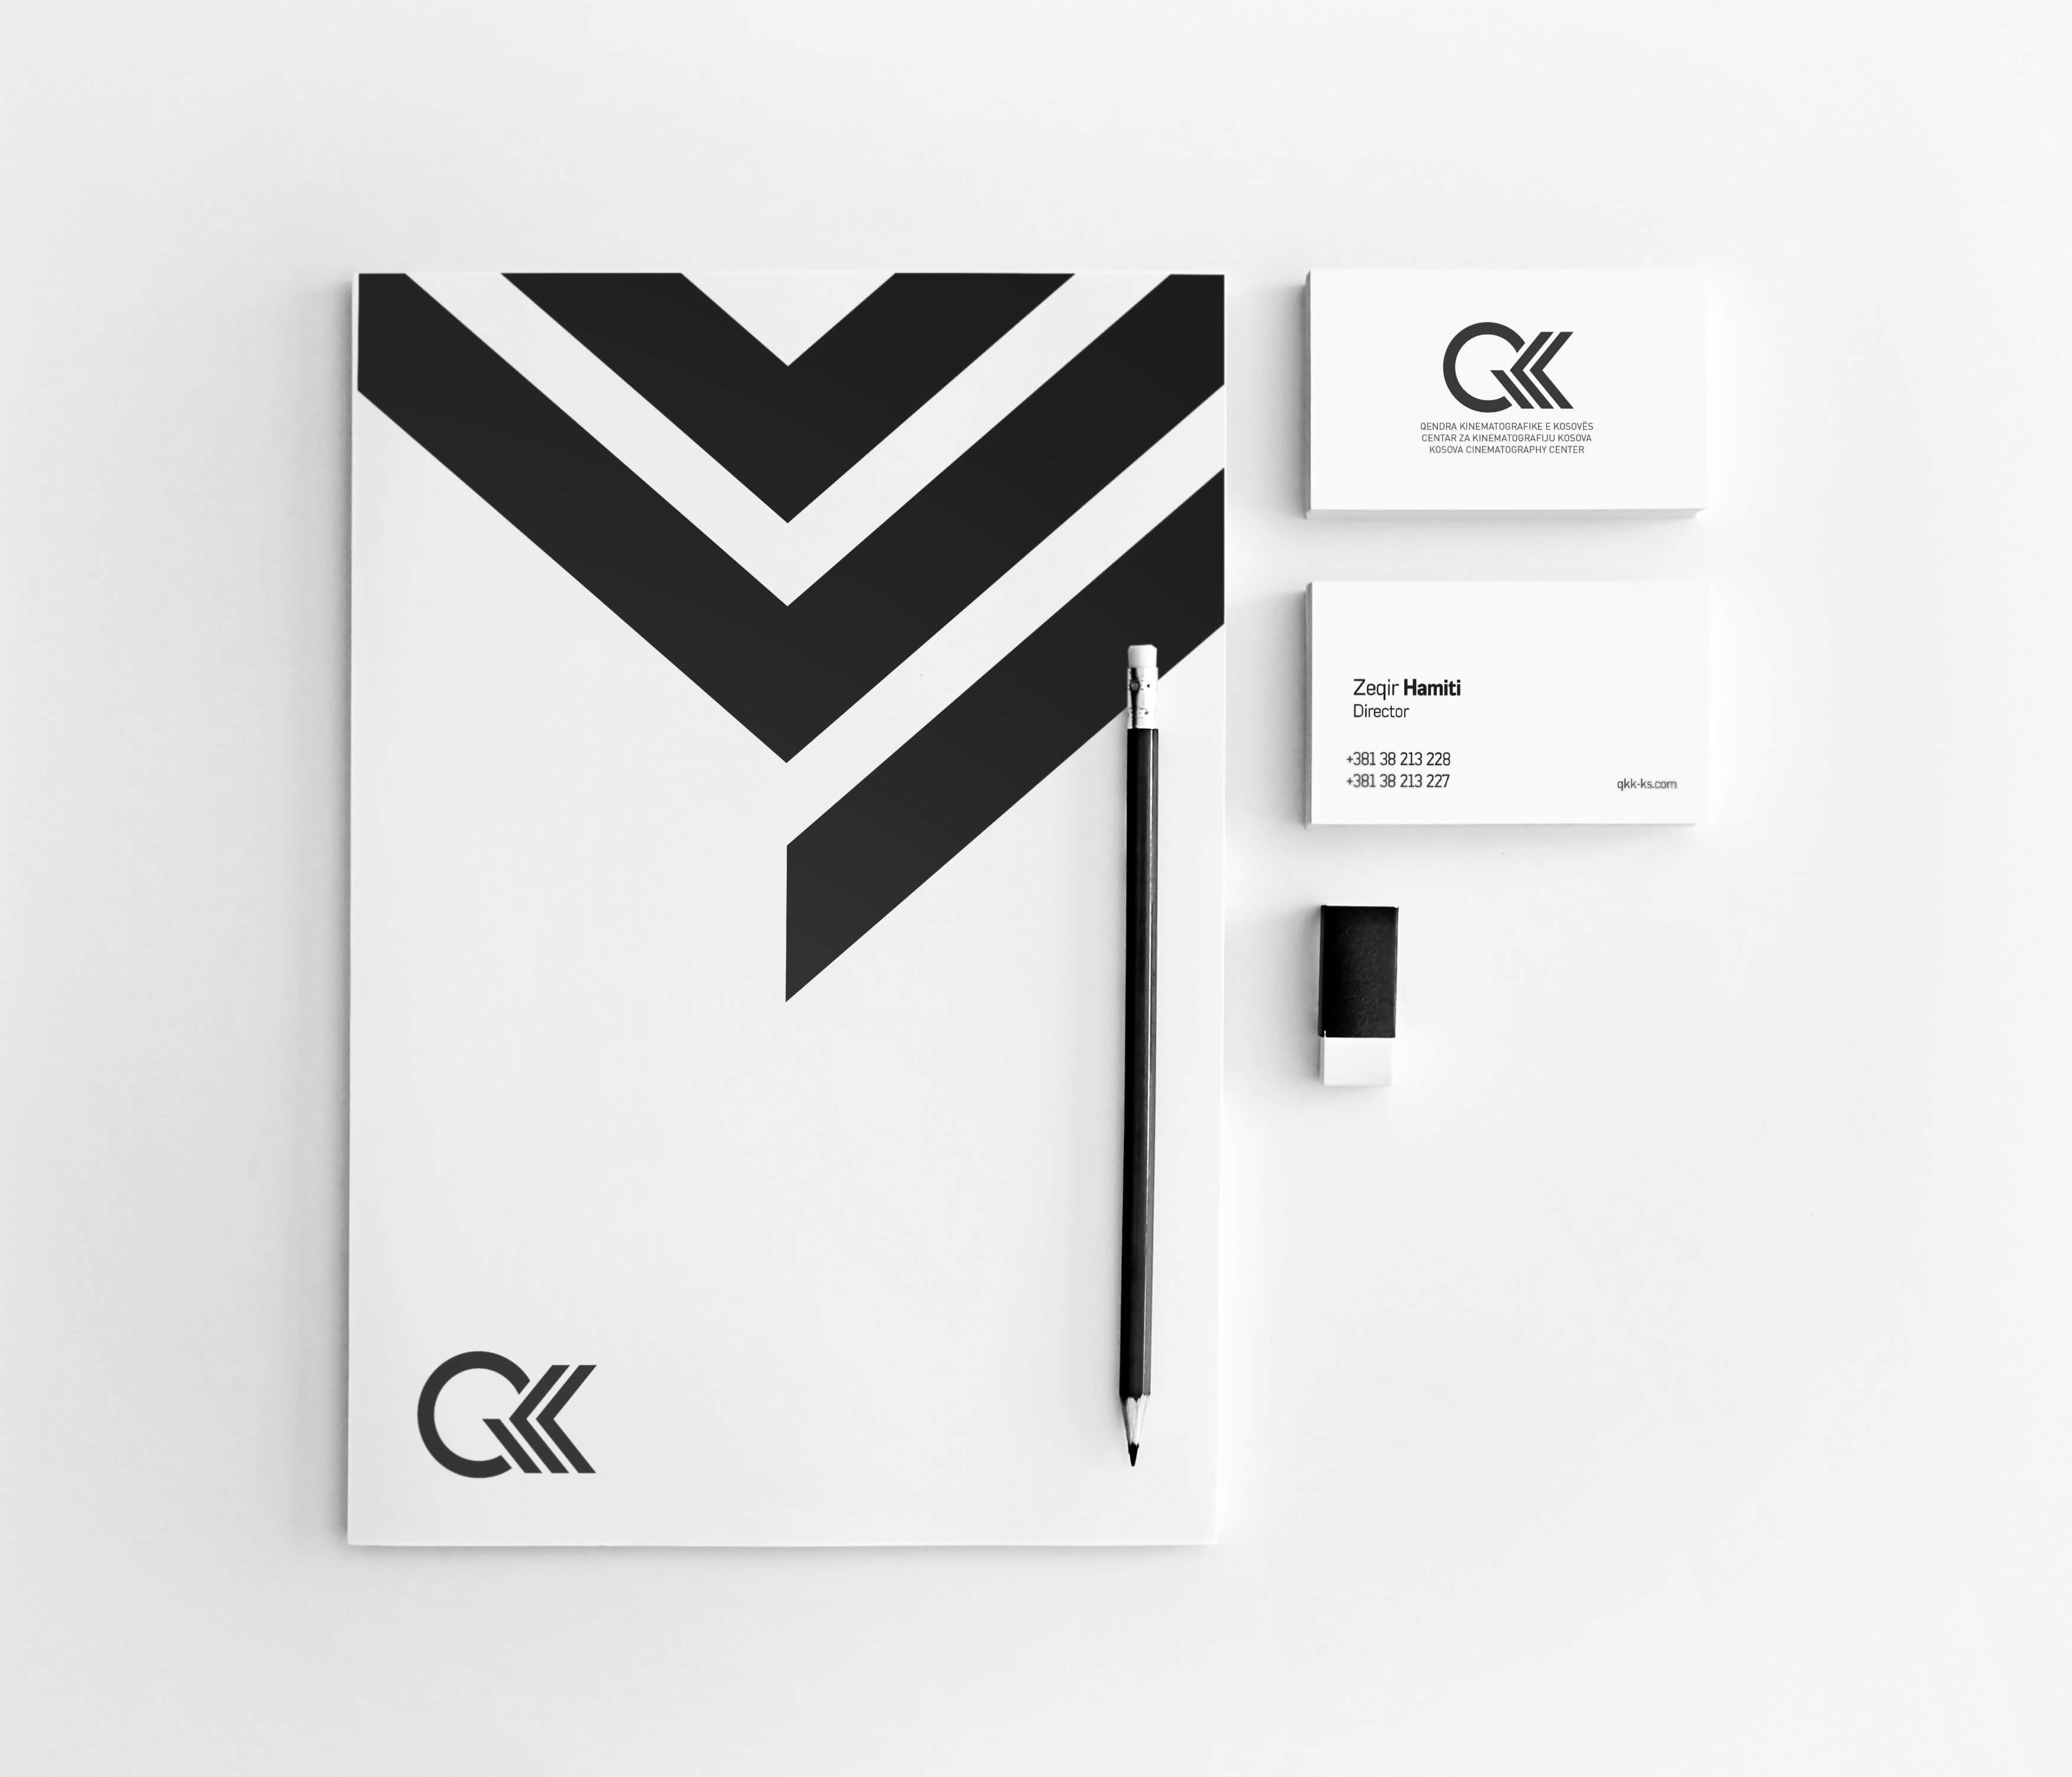 QKK_Identity